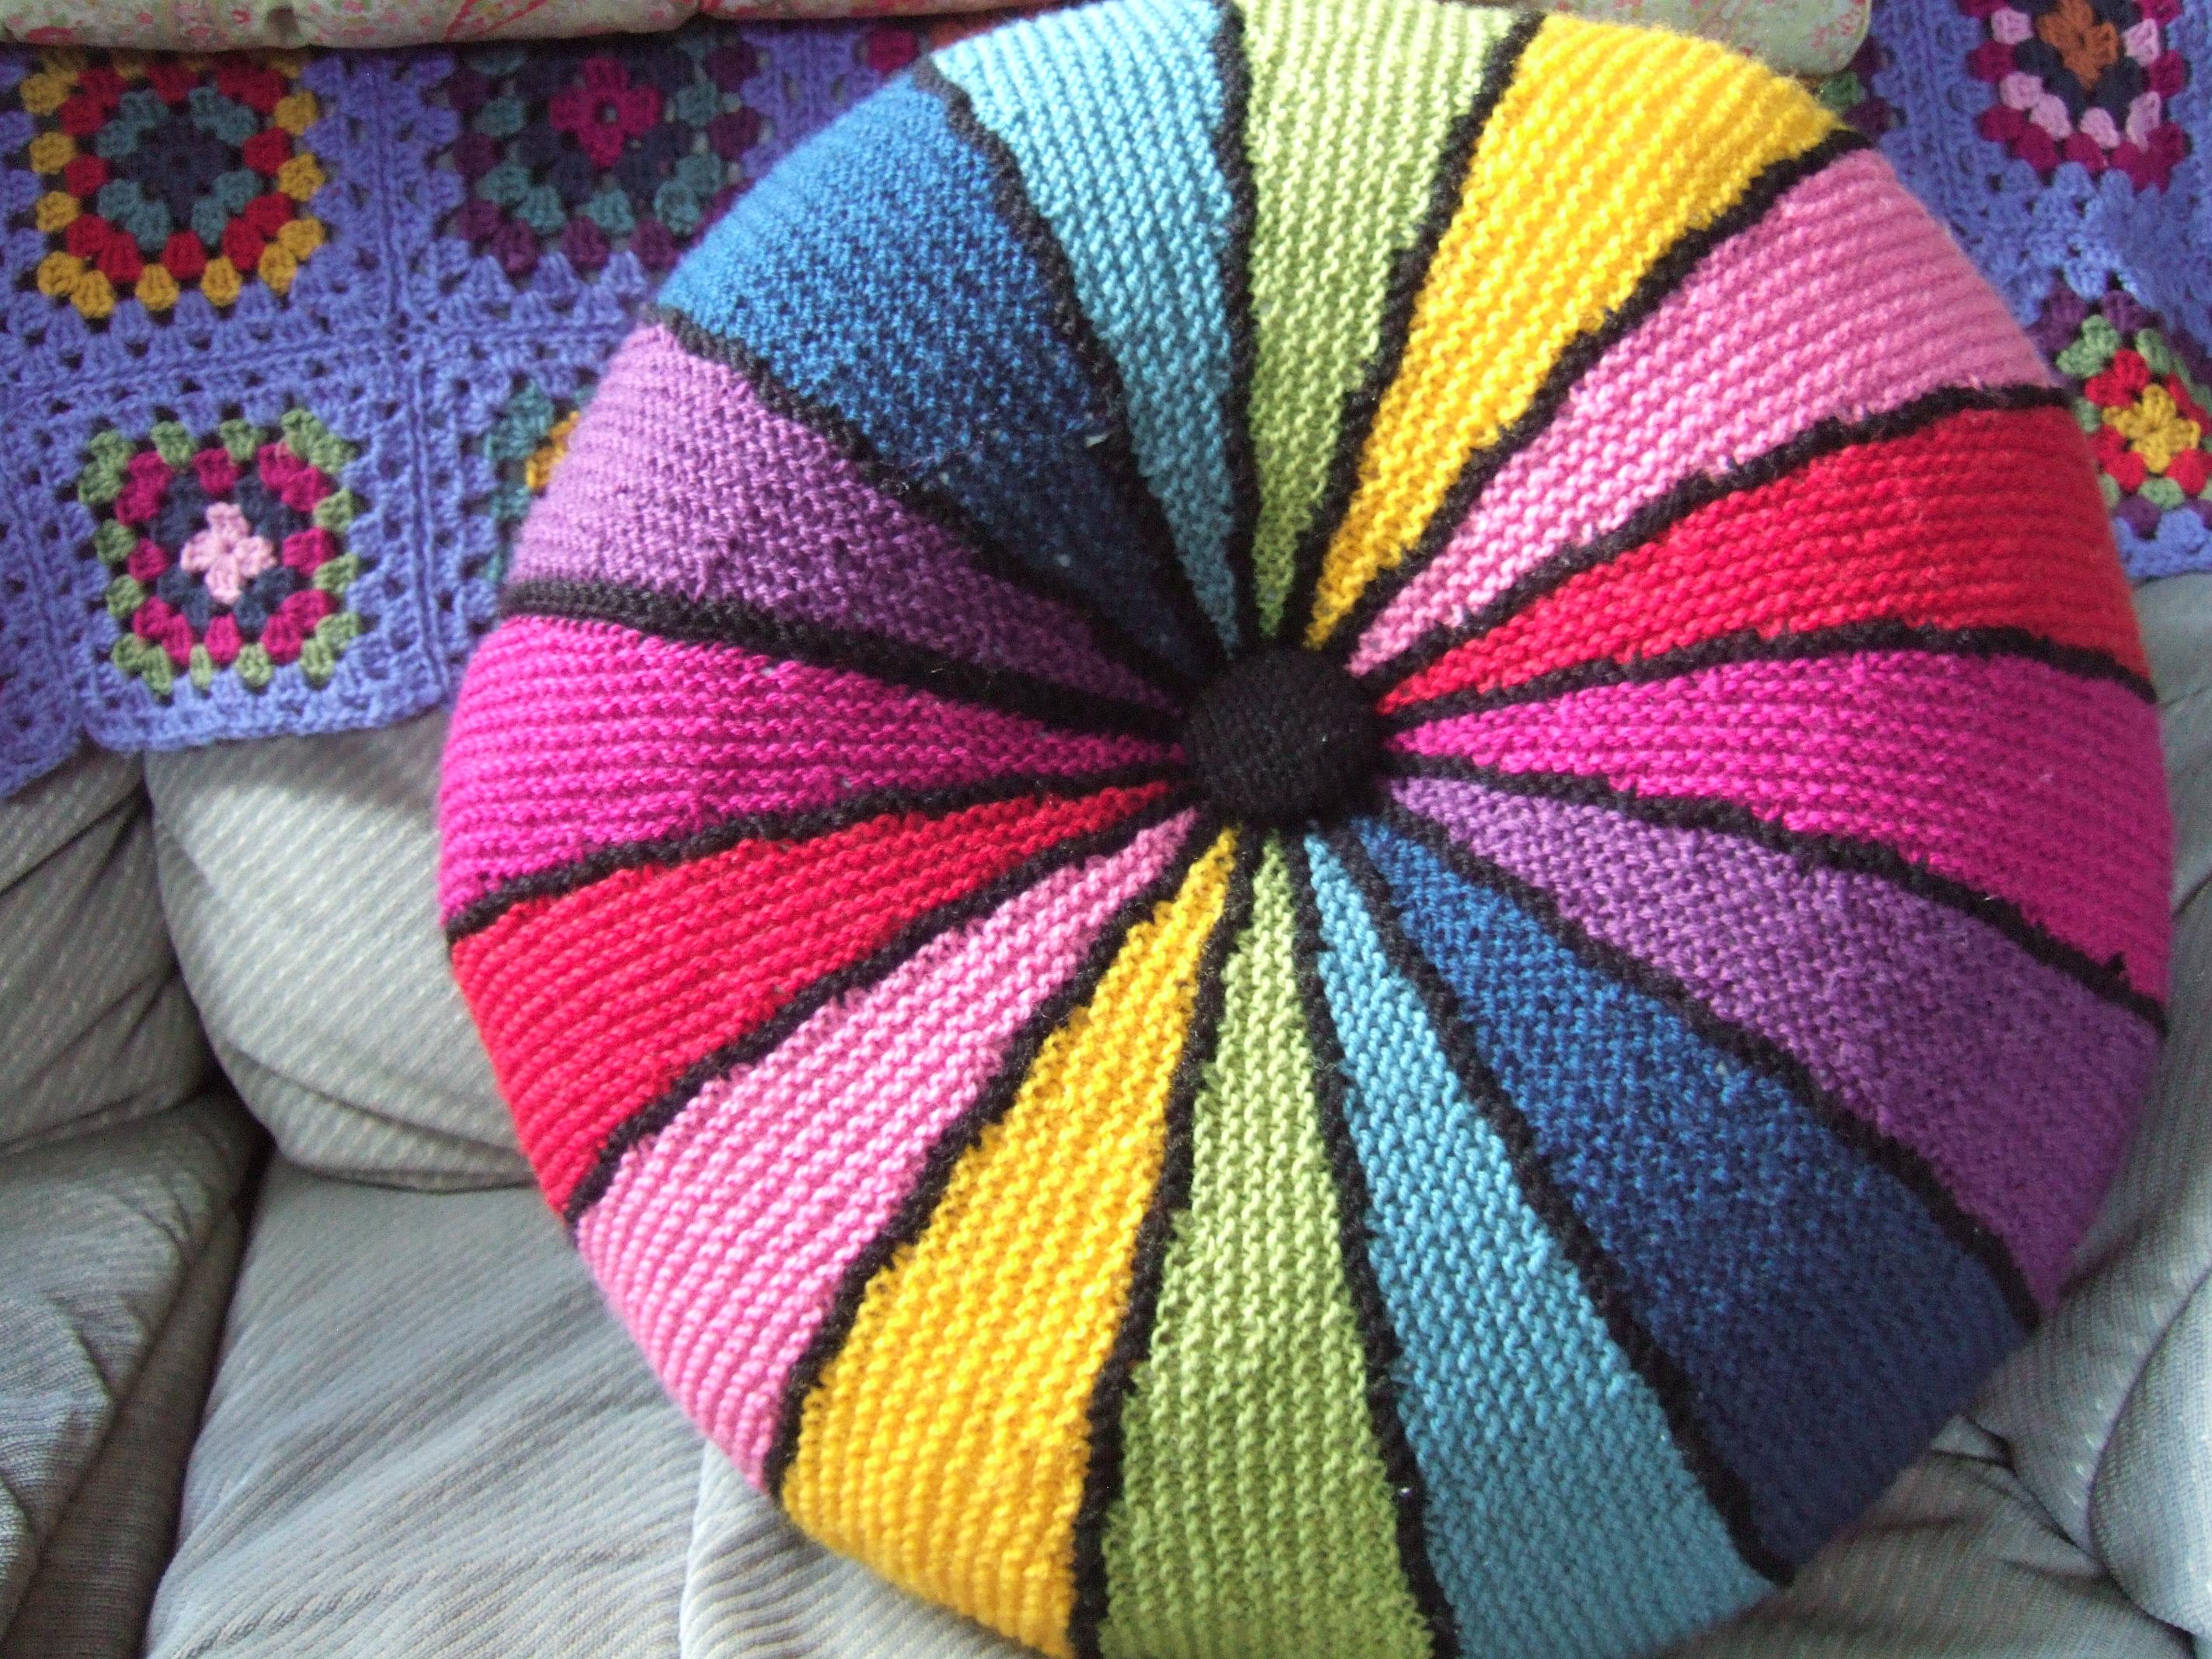 Knitted rainbow cushion Flickr - Photo Sharing!